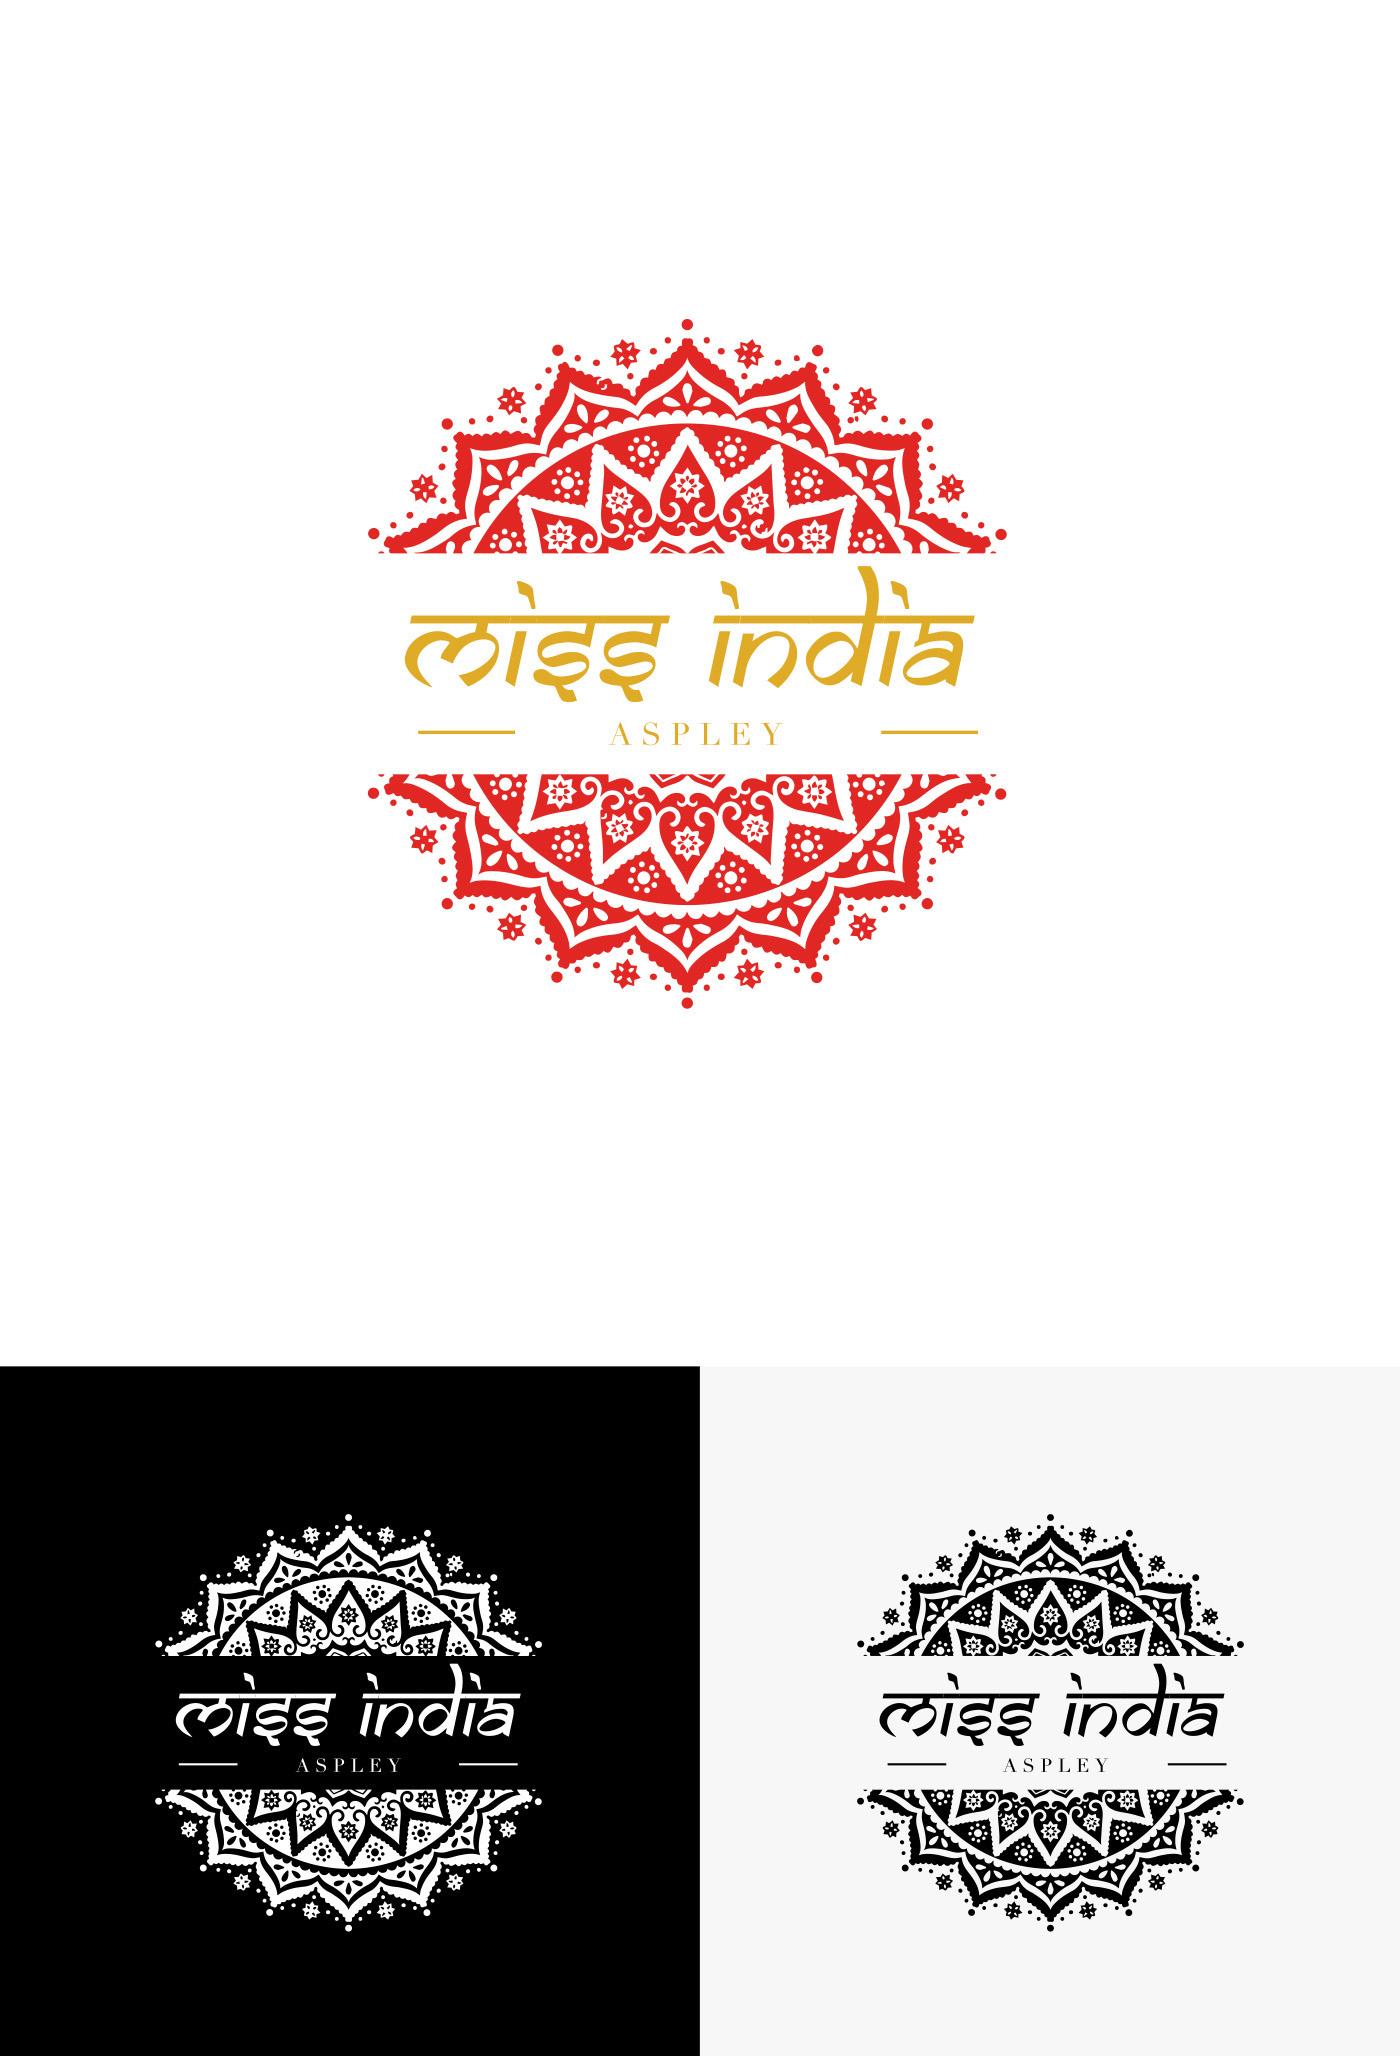 Indian logo fire logo Modern Logo chili logo restaurant logo logo for restaurant taj mahal logo flower logo logo in hindi Indian Restaurant classy restaurant logo Modern Restaurant Logo